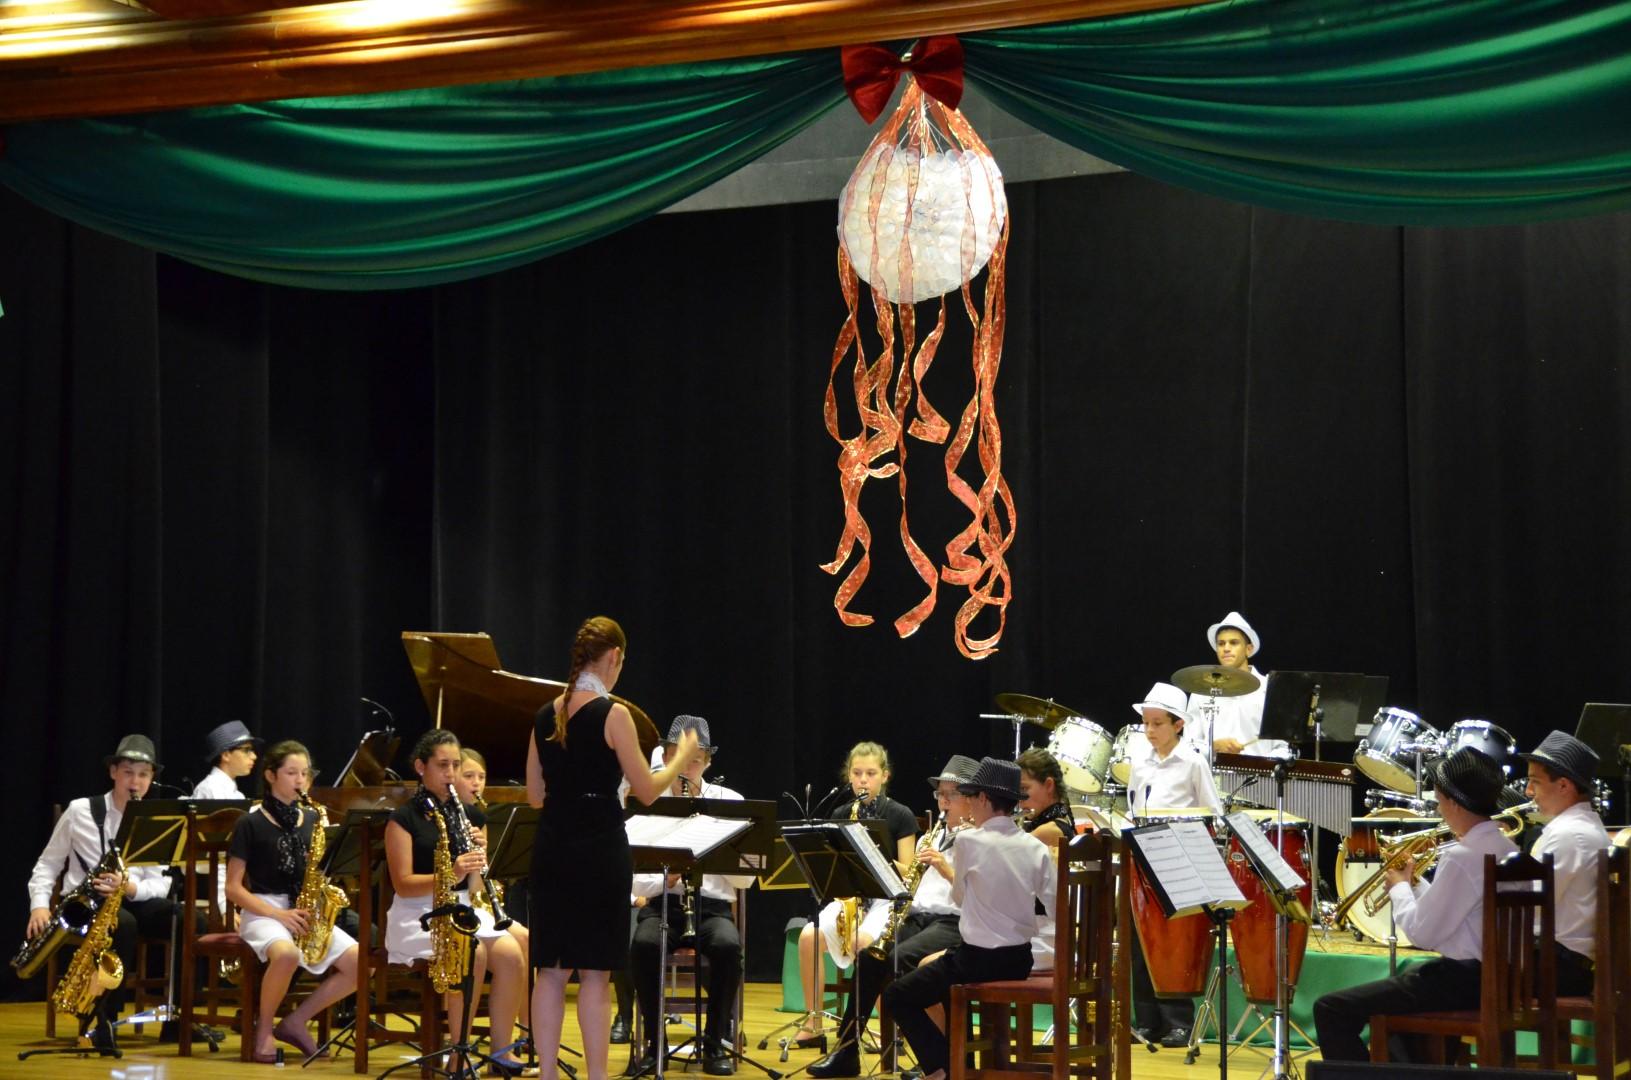 Orquestra de Iniciantes em Concerto - 14/12/2016Orquestra de Iniciantes em Concerto - 14/12/2016